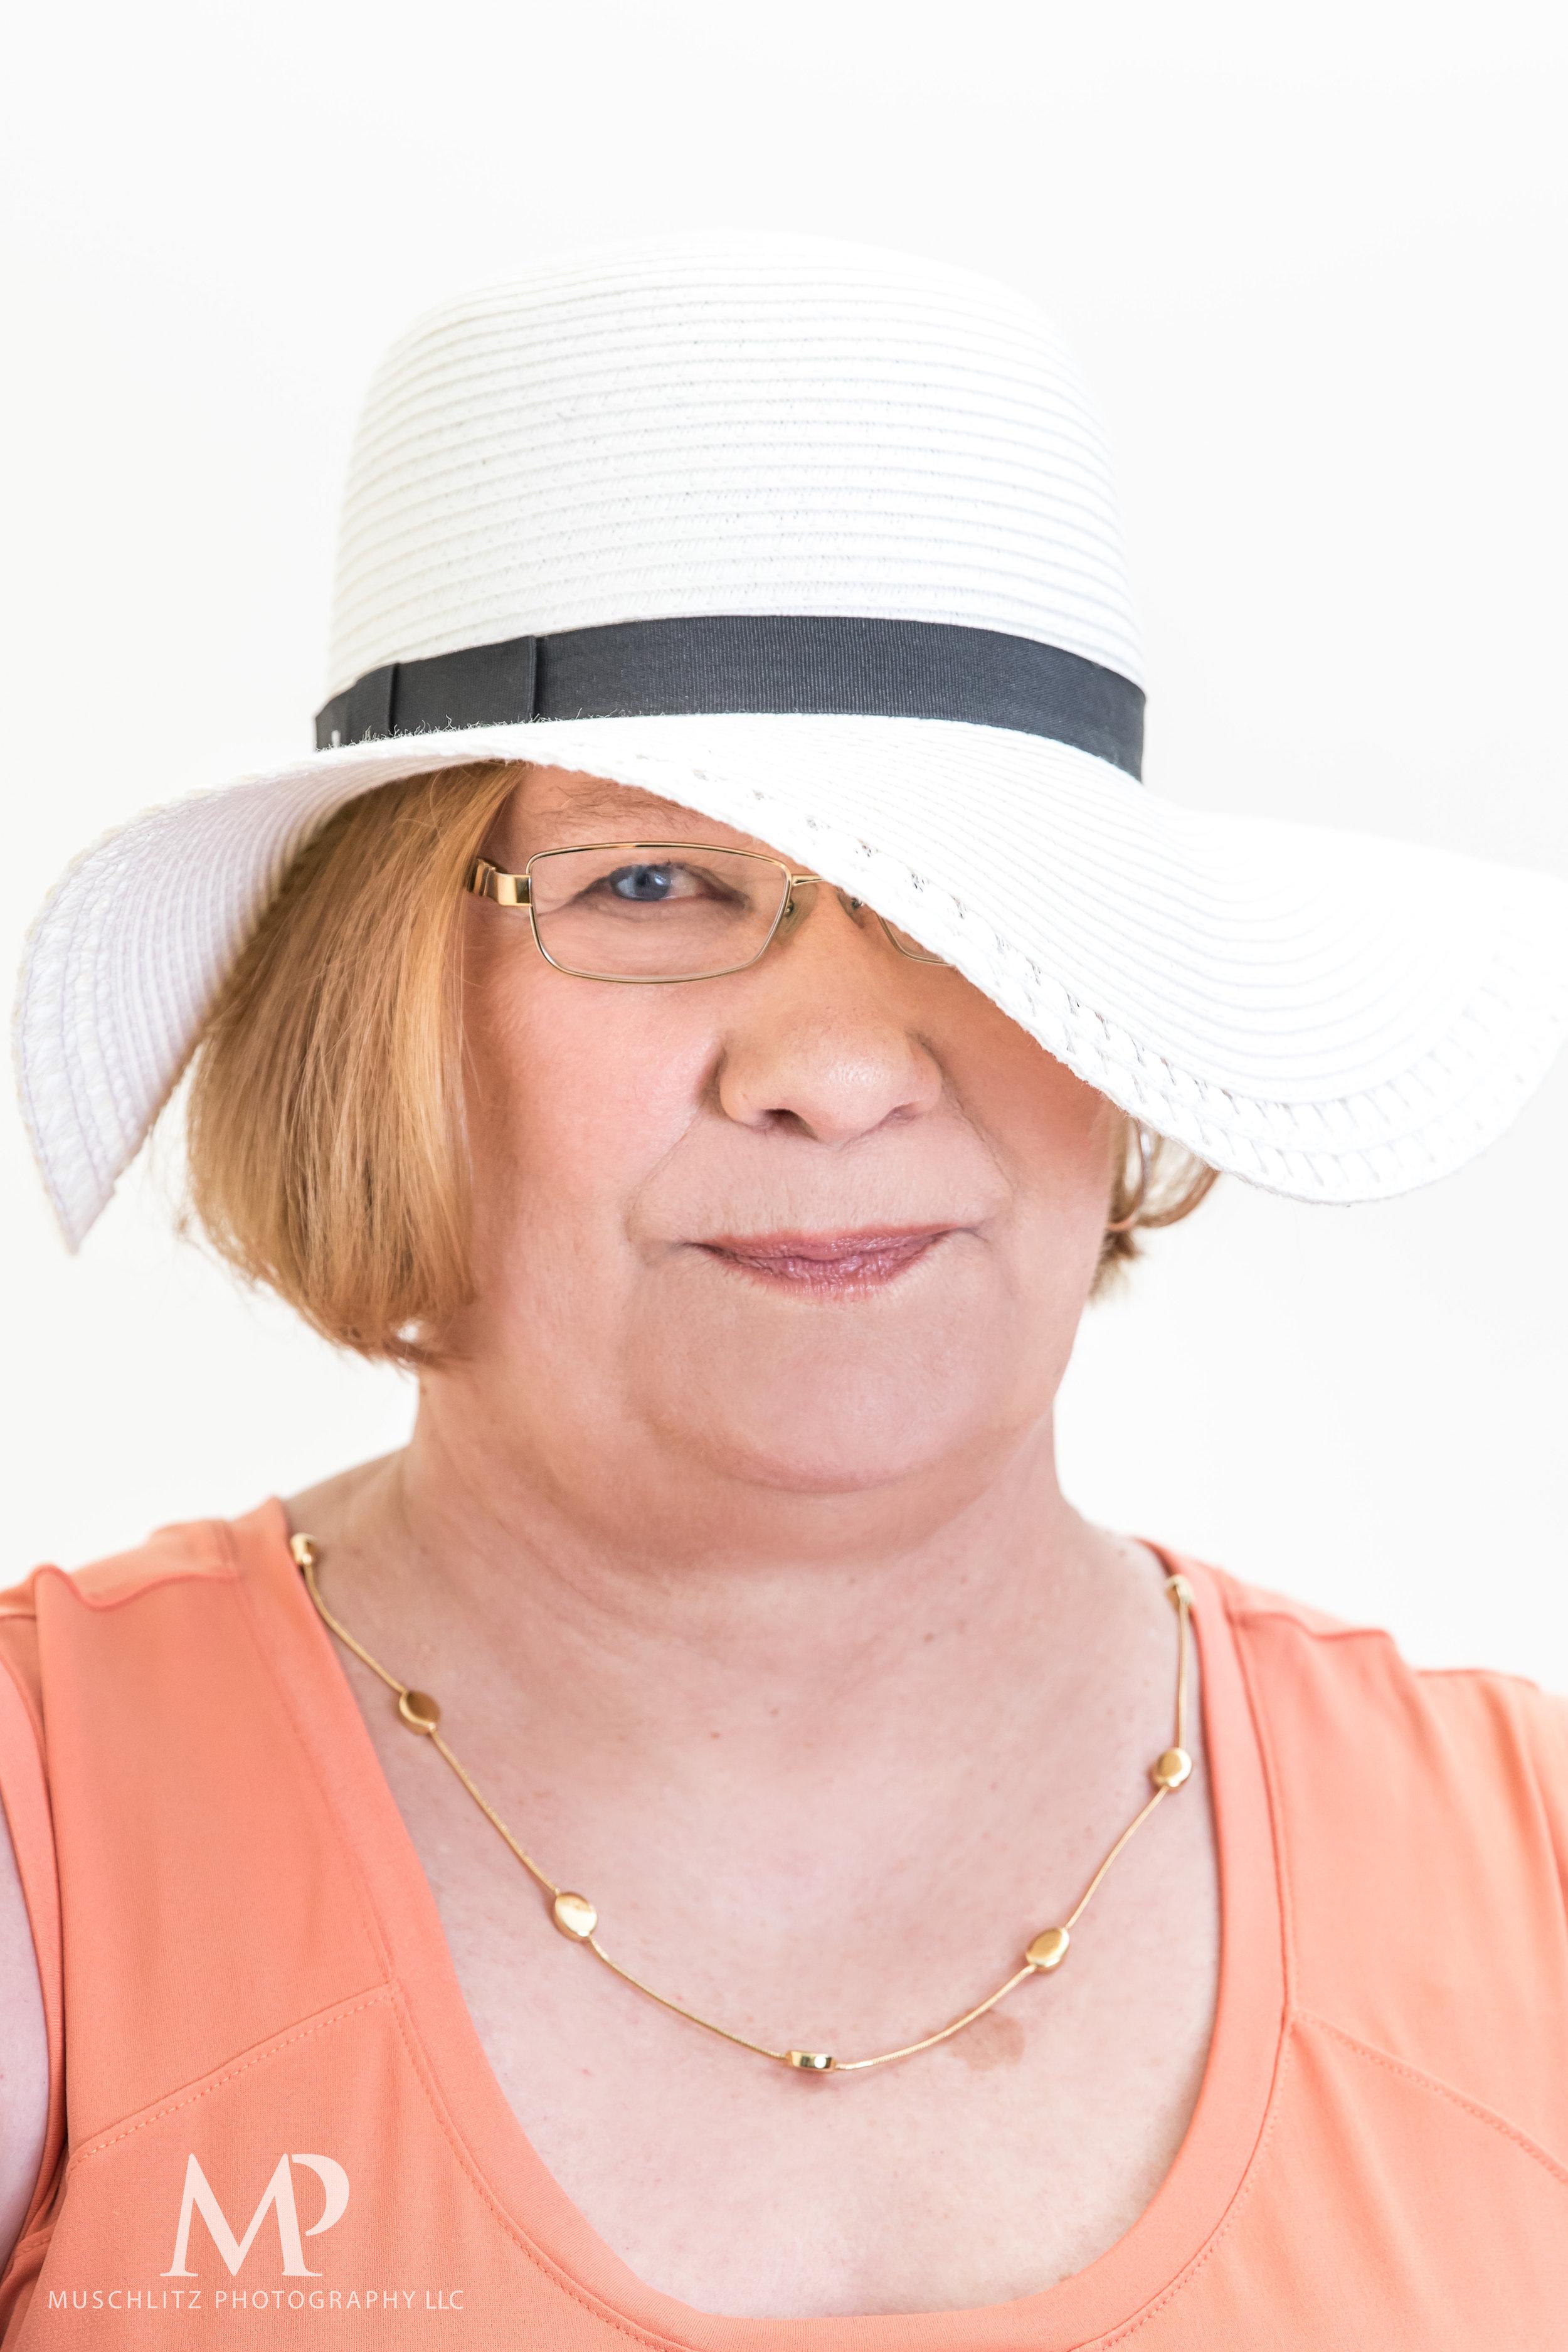 beauty-glamour-65-birthday-portrait-session-portraits-columbus-ohio-muschlitz-photography-036.JPG